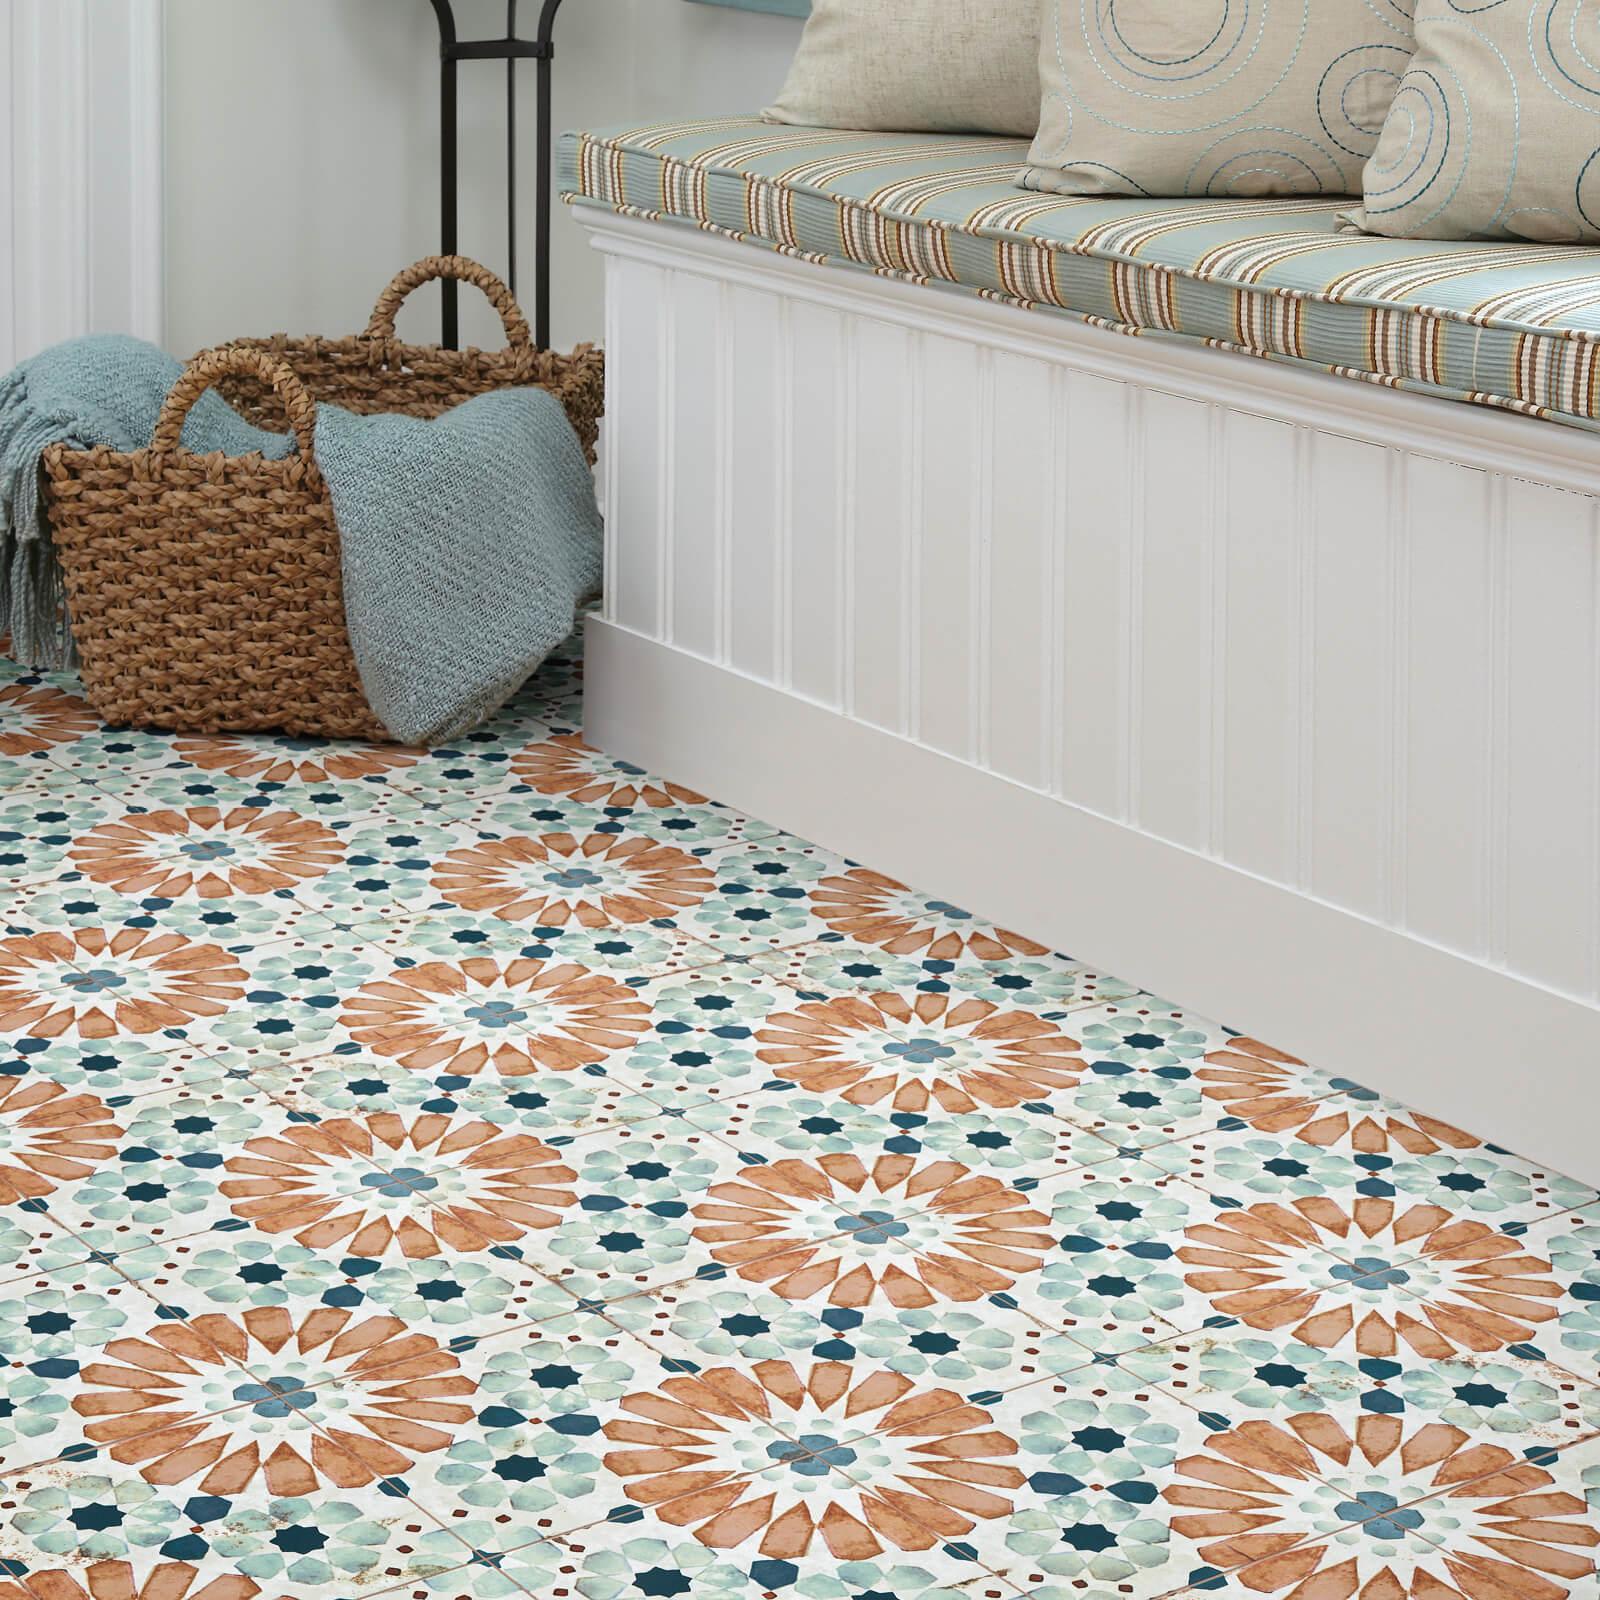 Islander tiles   H&R Carpets and Flooring